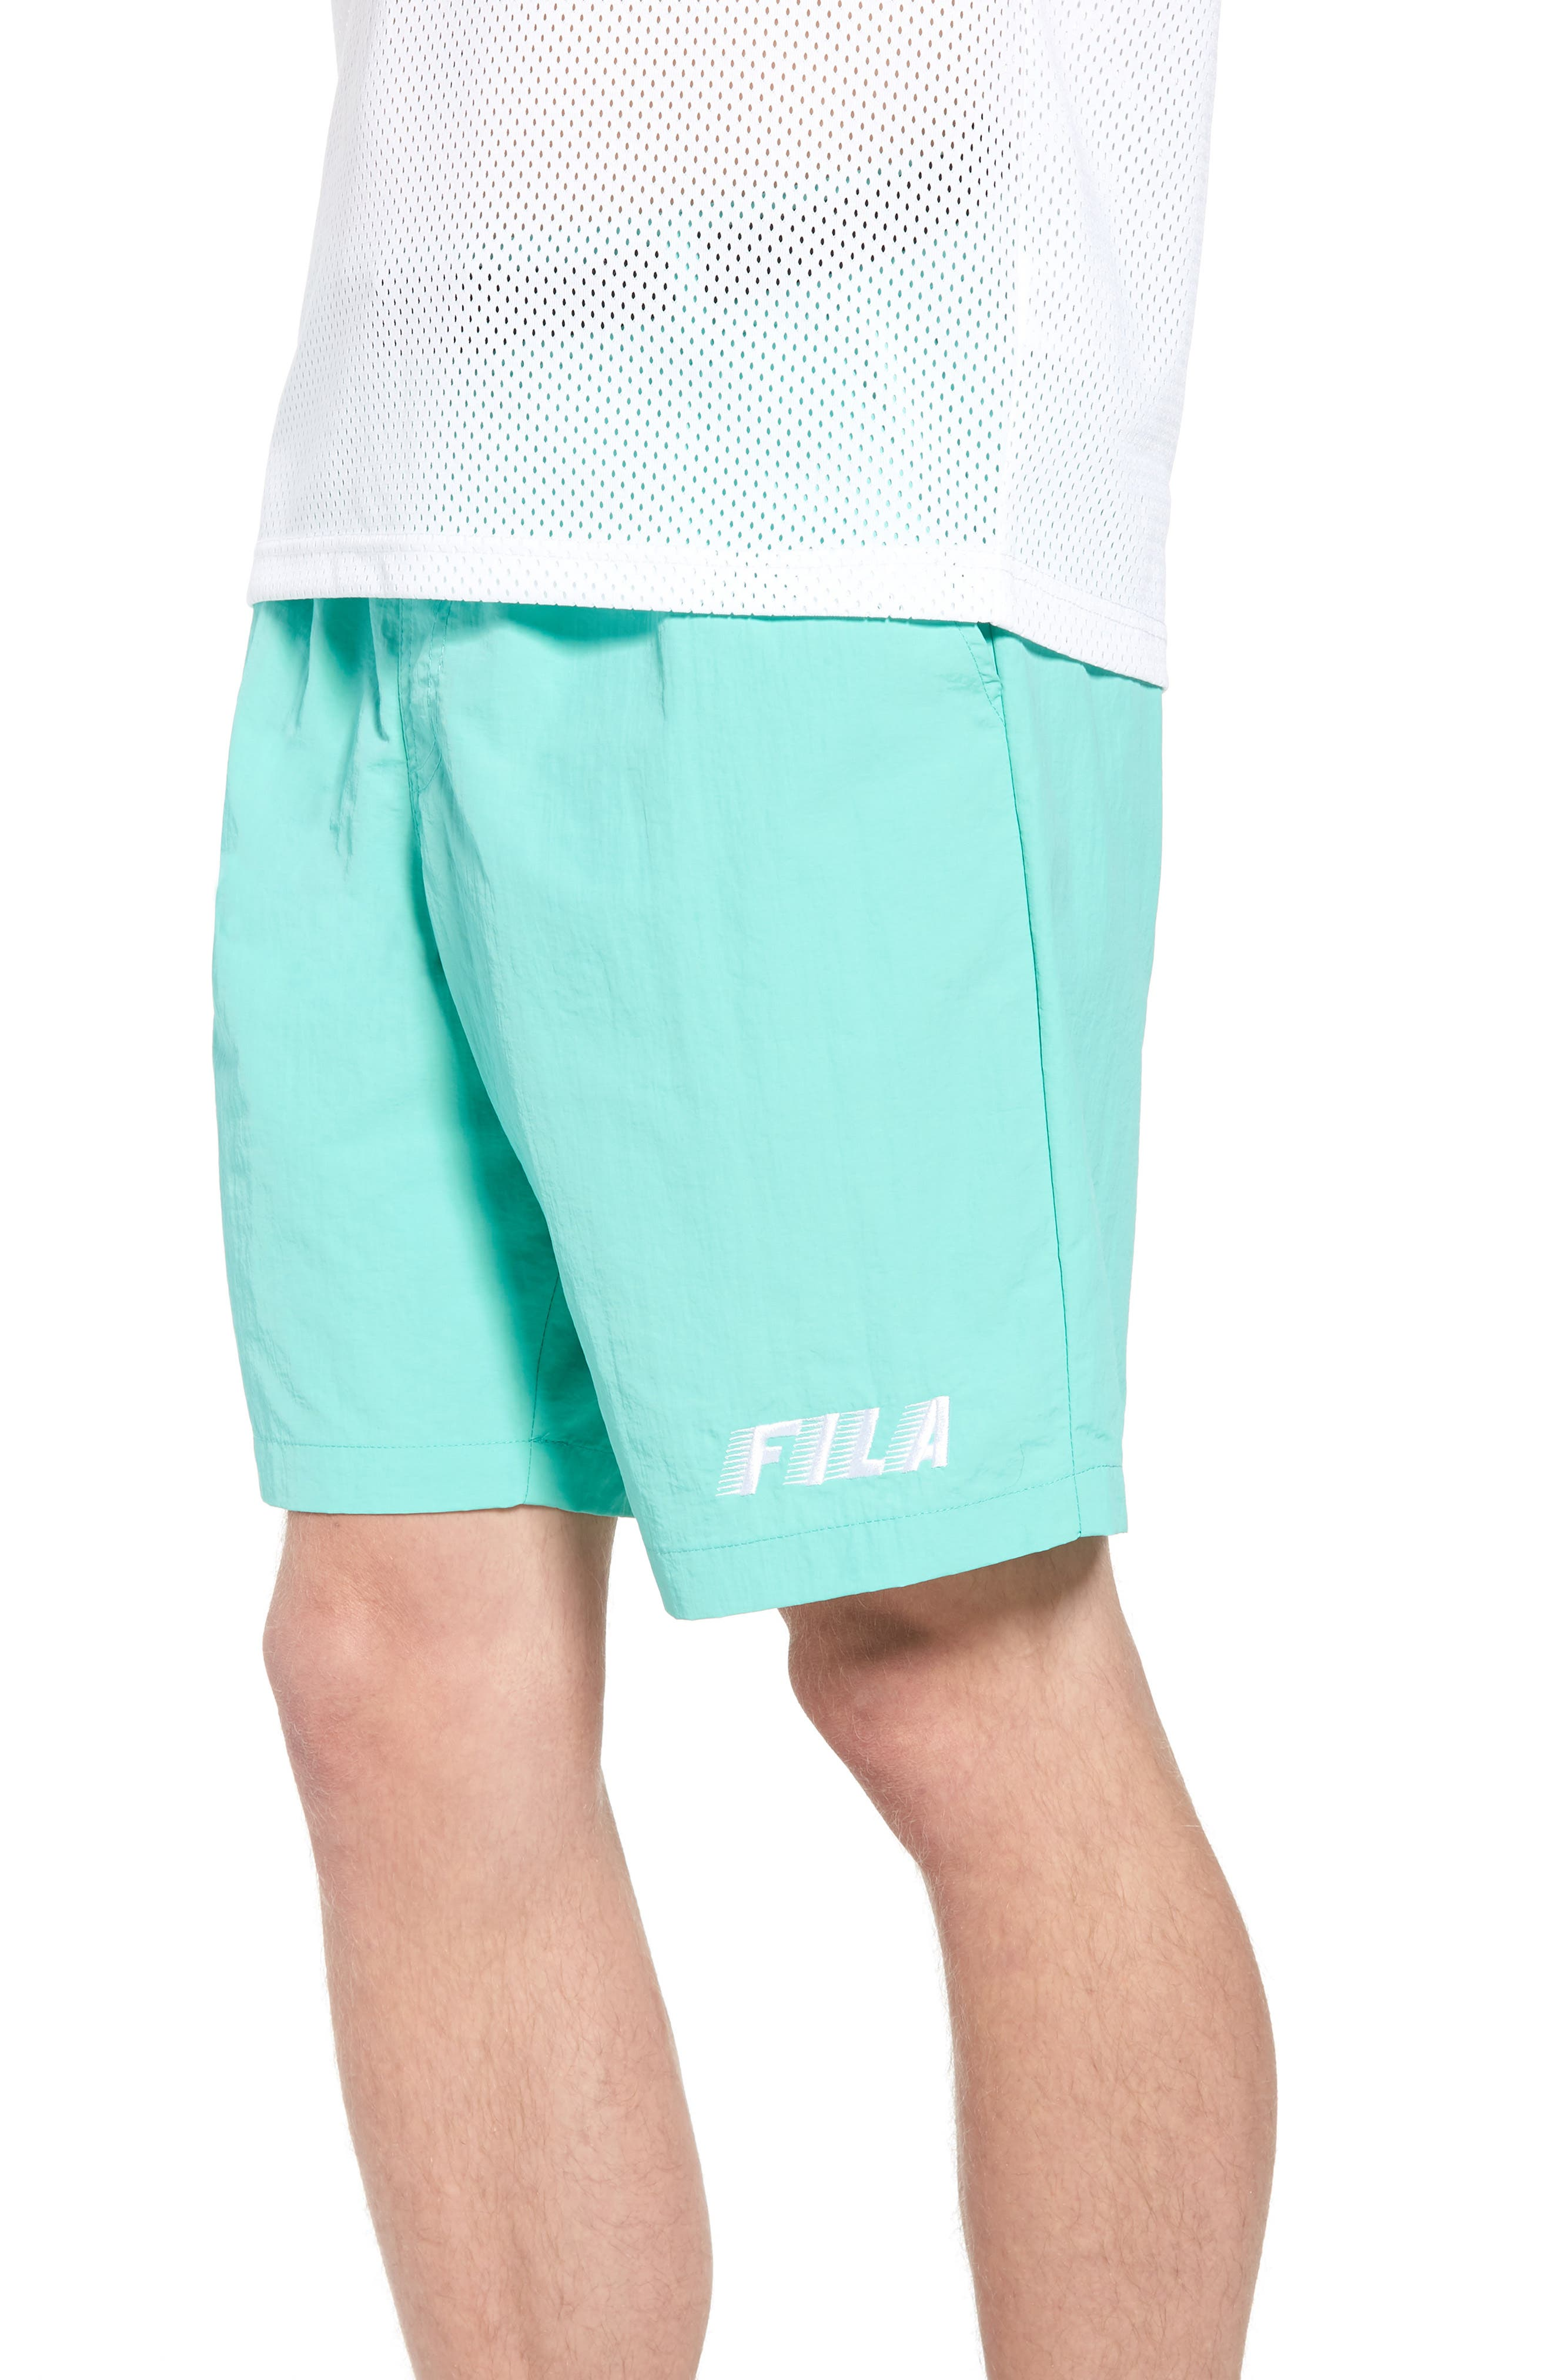 Mondy Shorts,                             Alternate thumbnail 12, color,